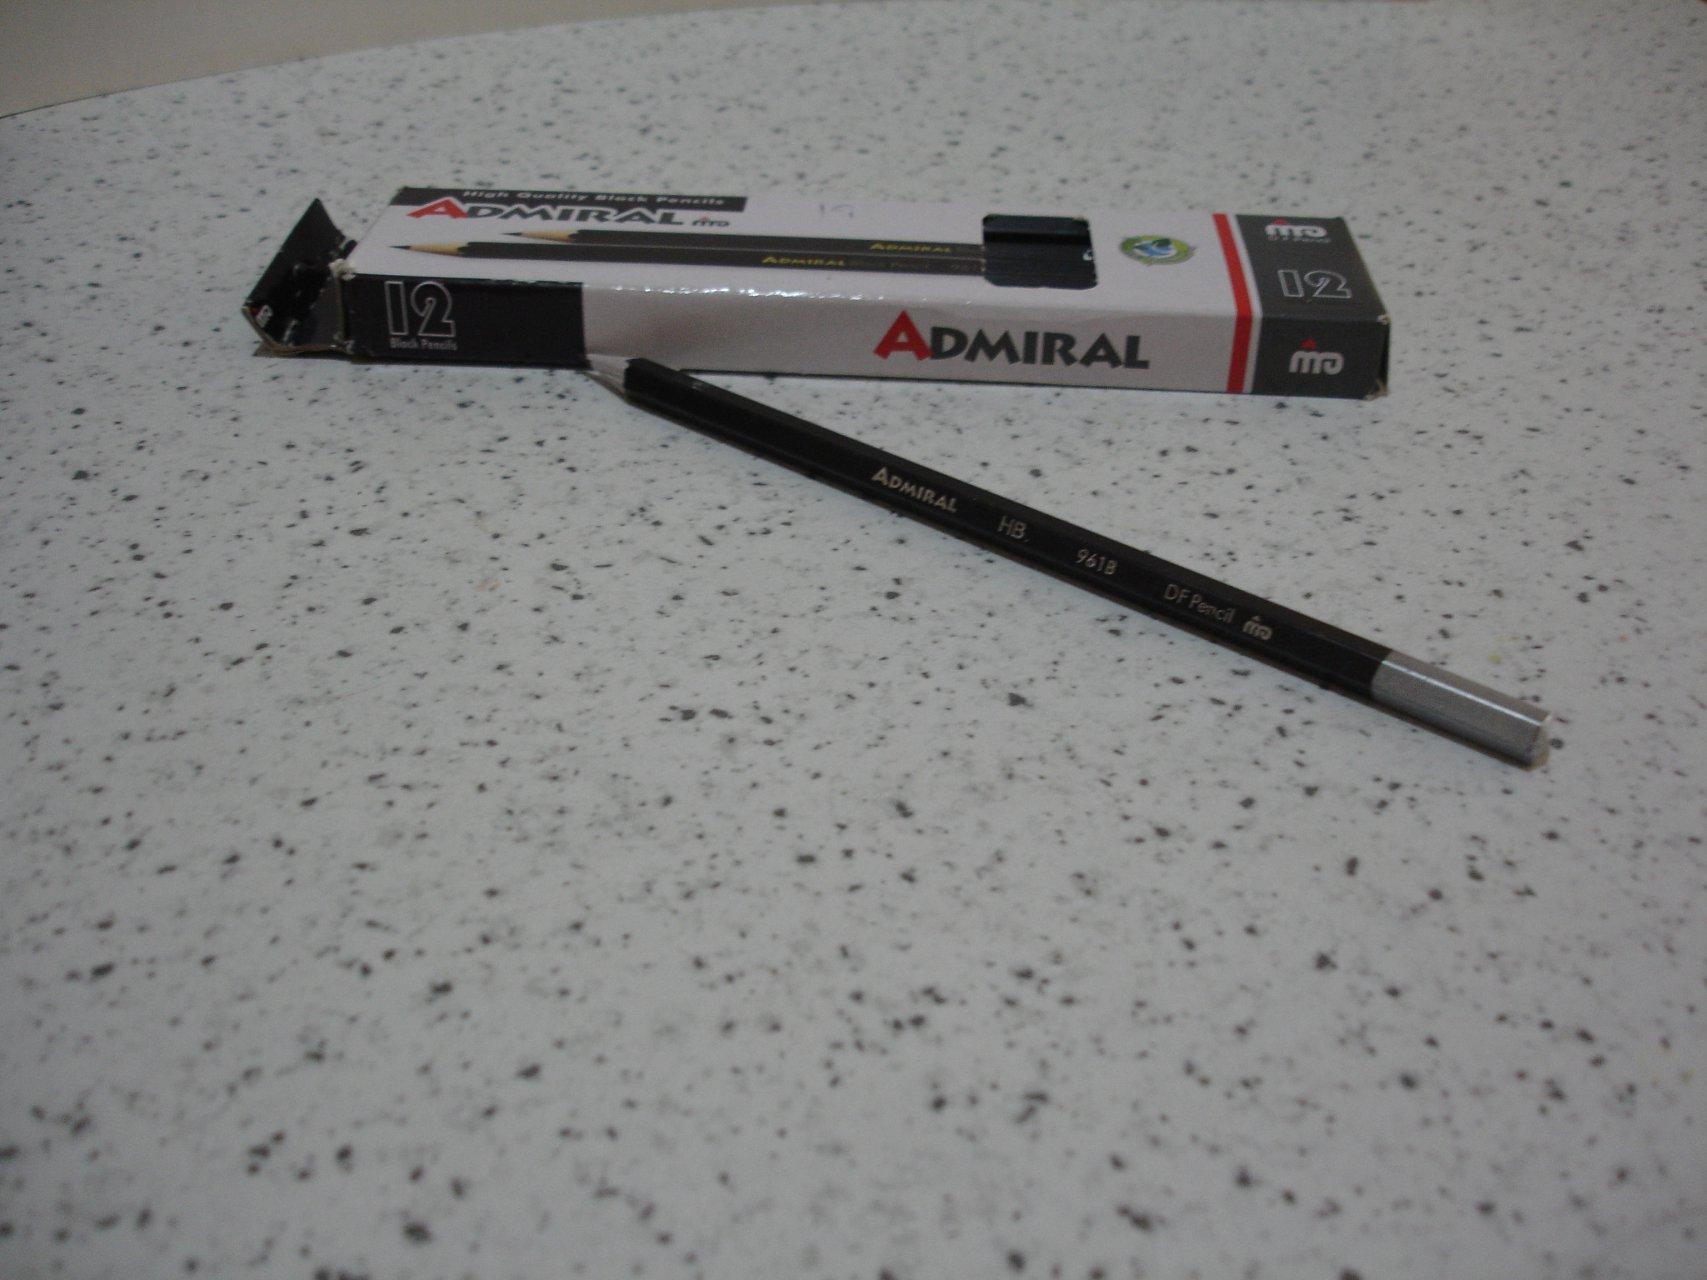 مداد مشکی ادمیرال